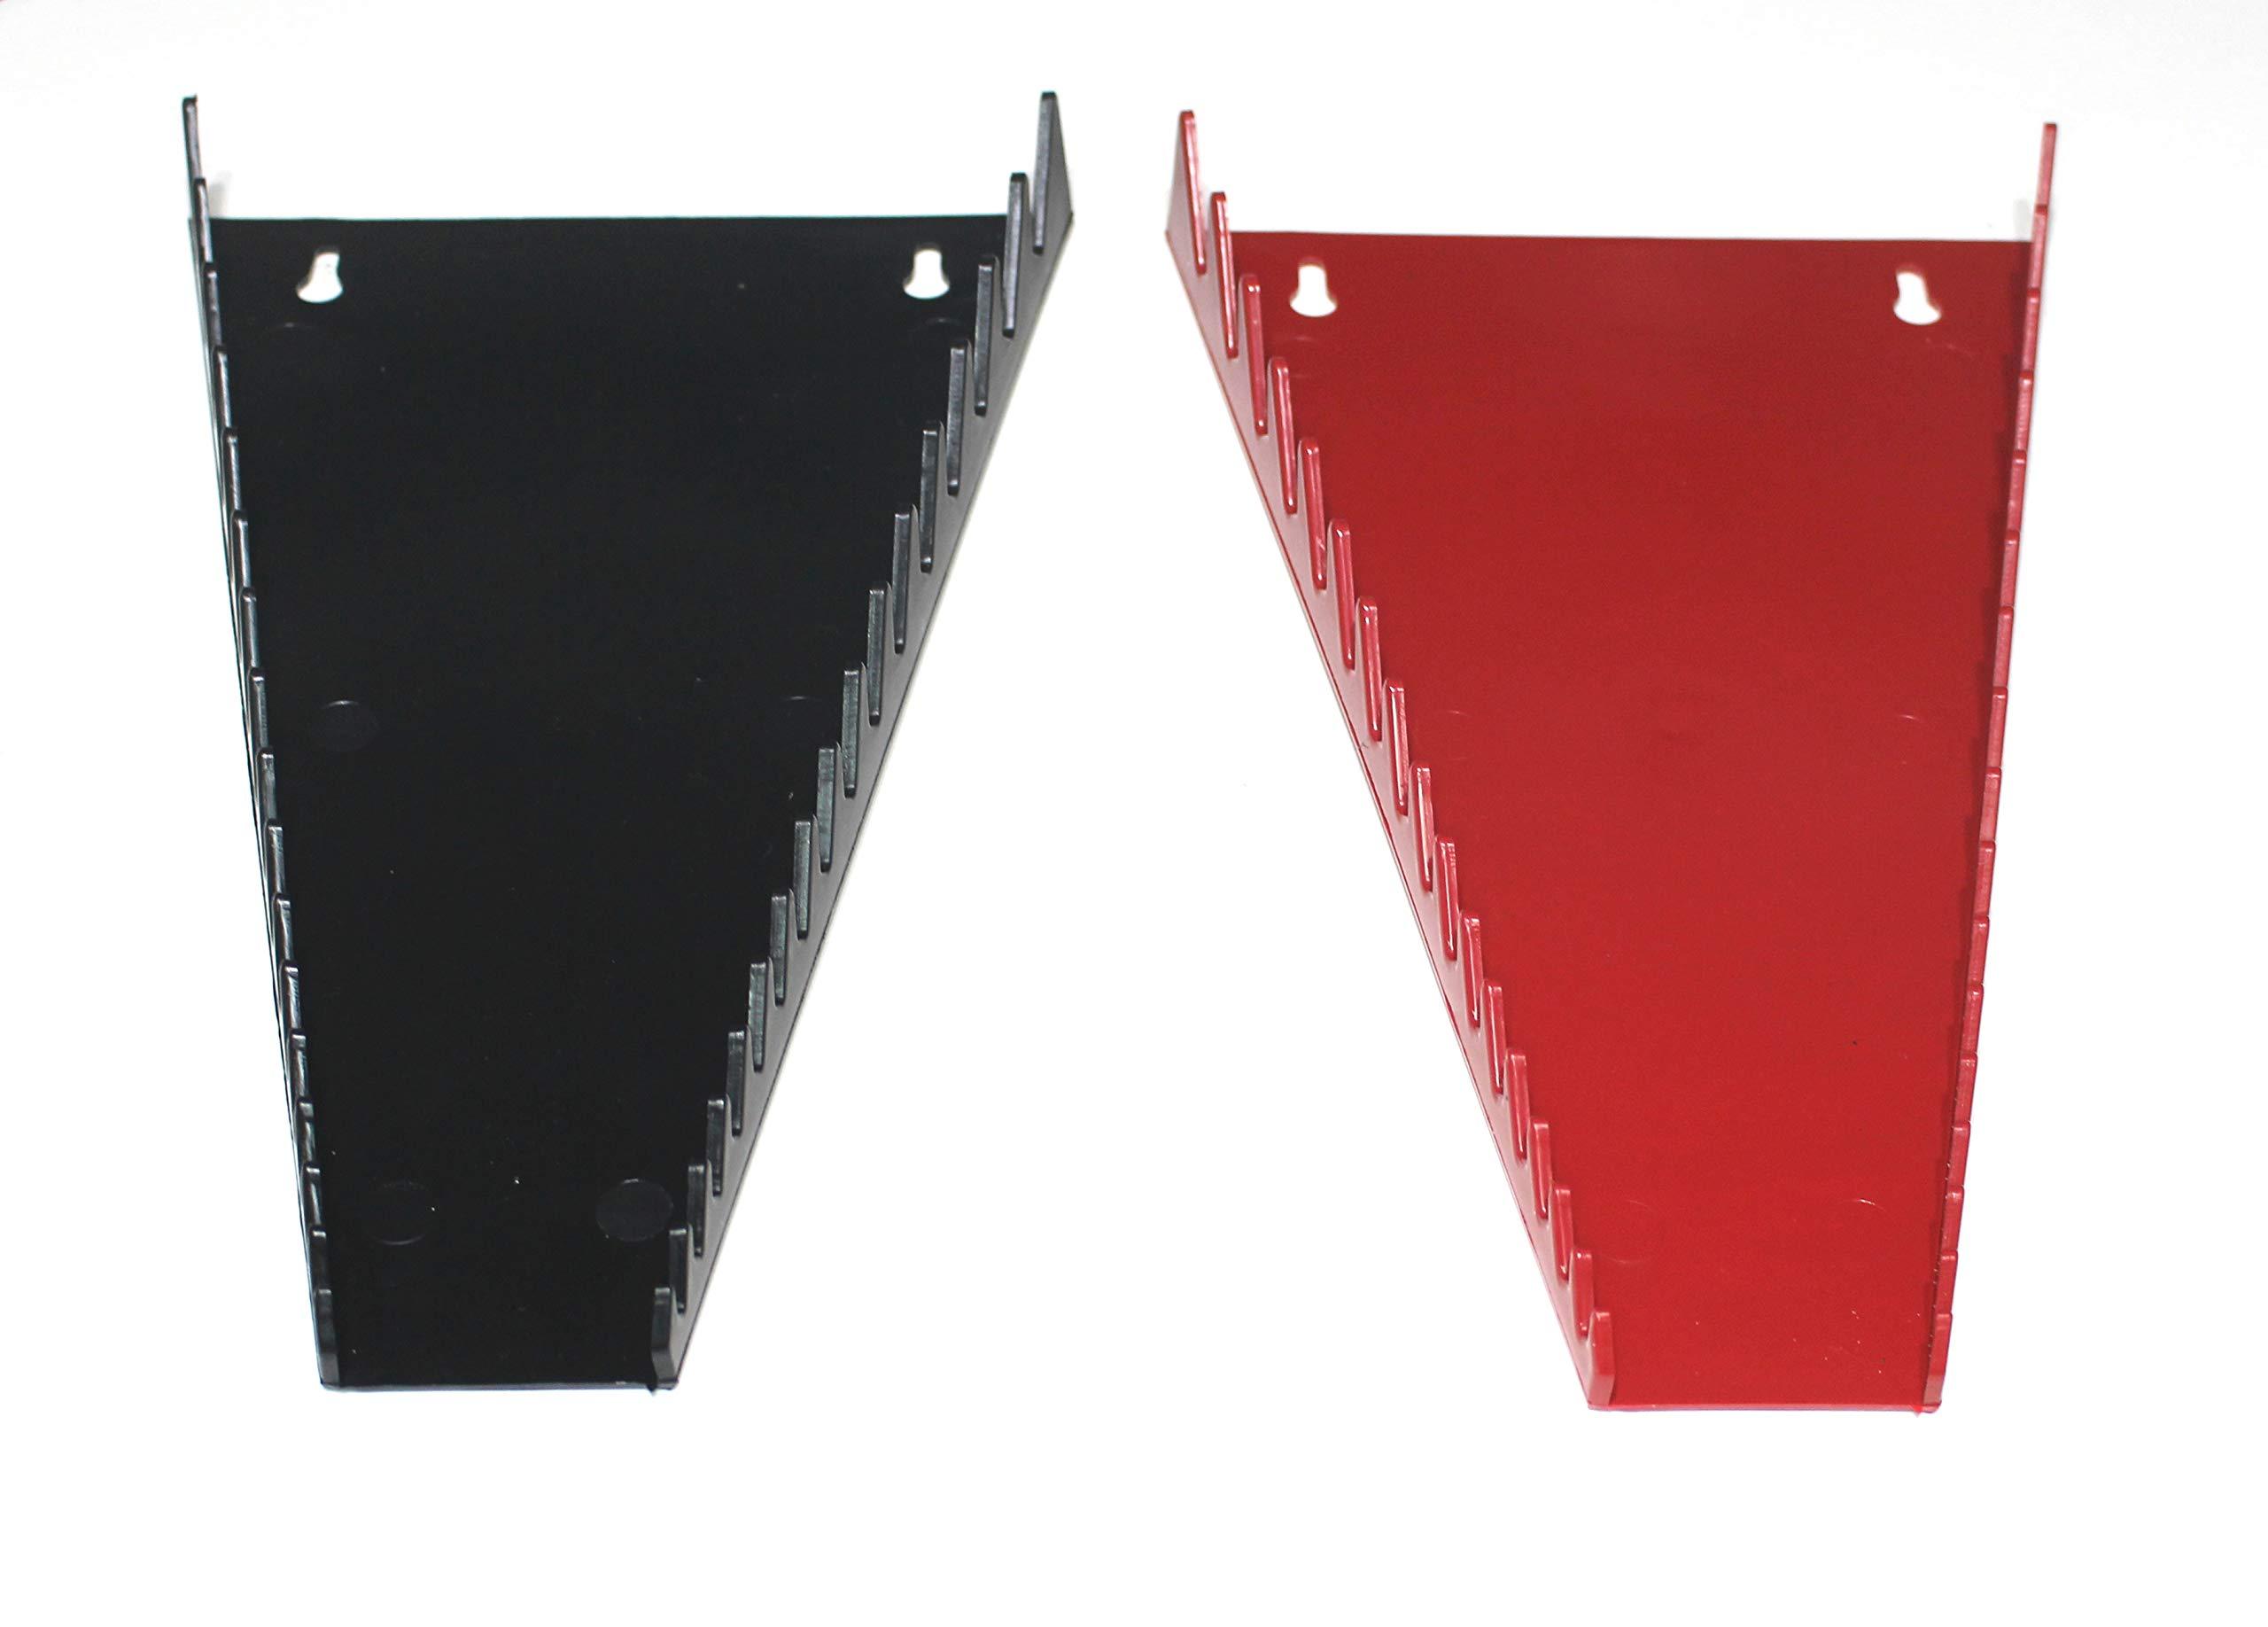 JSP Manufacturing Red & Black 16 Tool Standard Wrench Holder Wrench Organizer 2 Pack   Storage Rack Tray Tool Holder by JSP Manufacturing